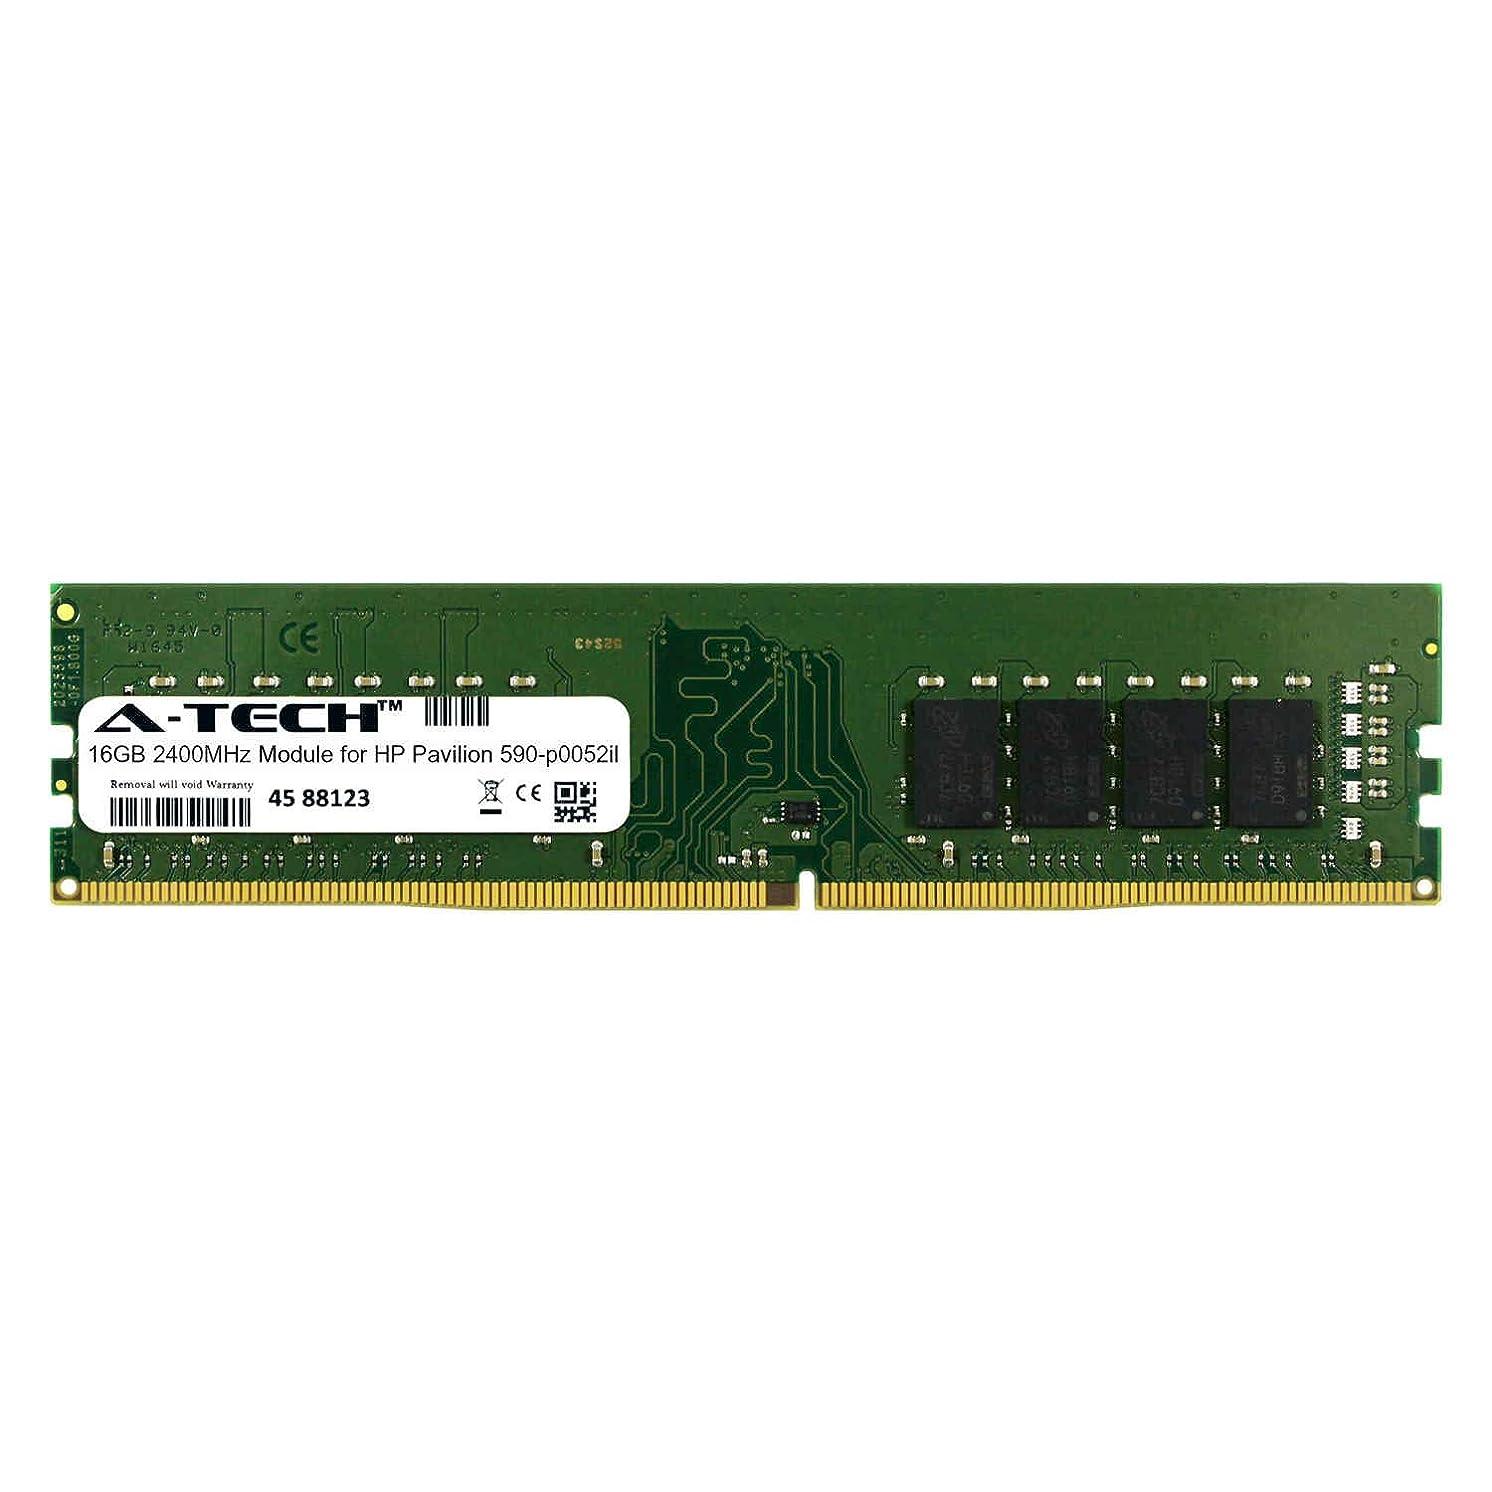 A-Tech 16GB Module for HP Pavilion 590-p0052il Desktop & Workstation Motherboard Compatible DDR4 2400Mhz Memory Ram (ATMS311310A25822X1)